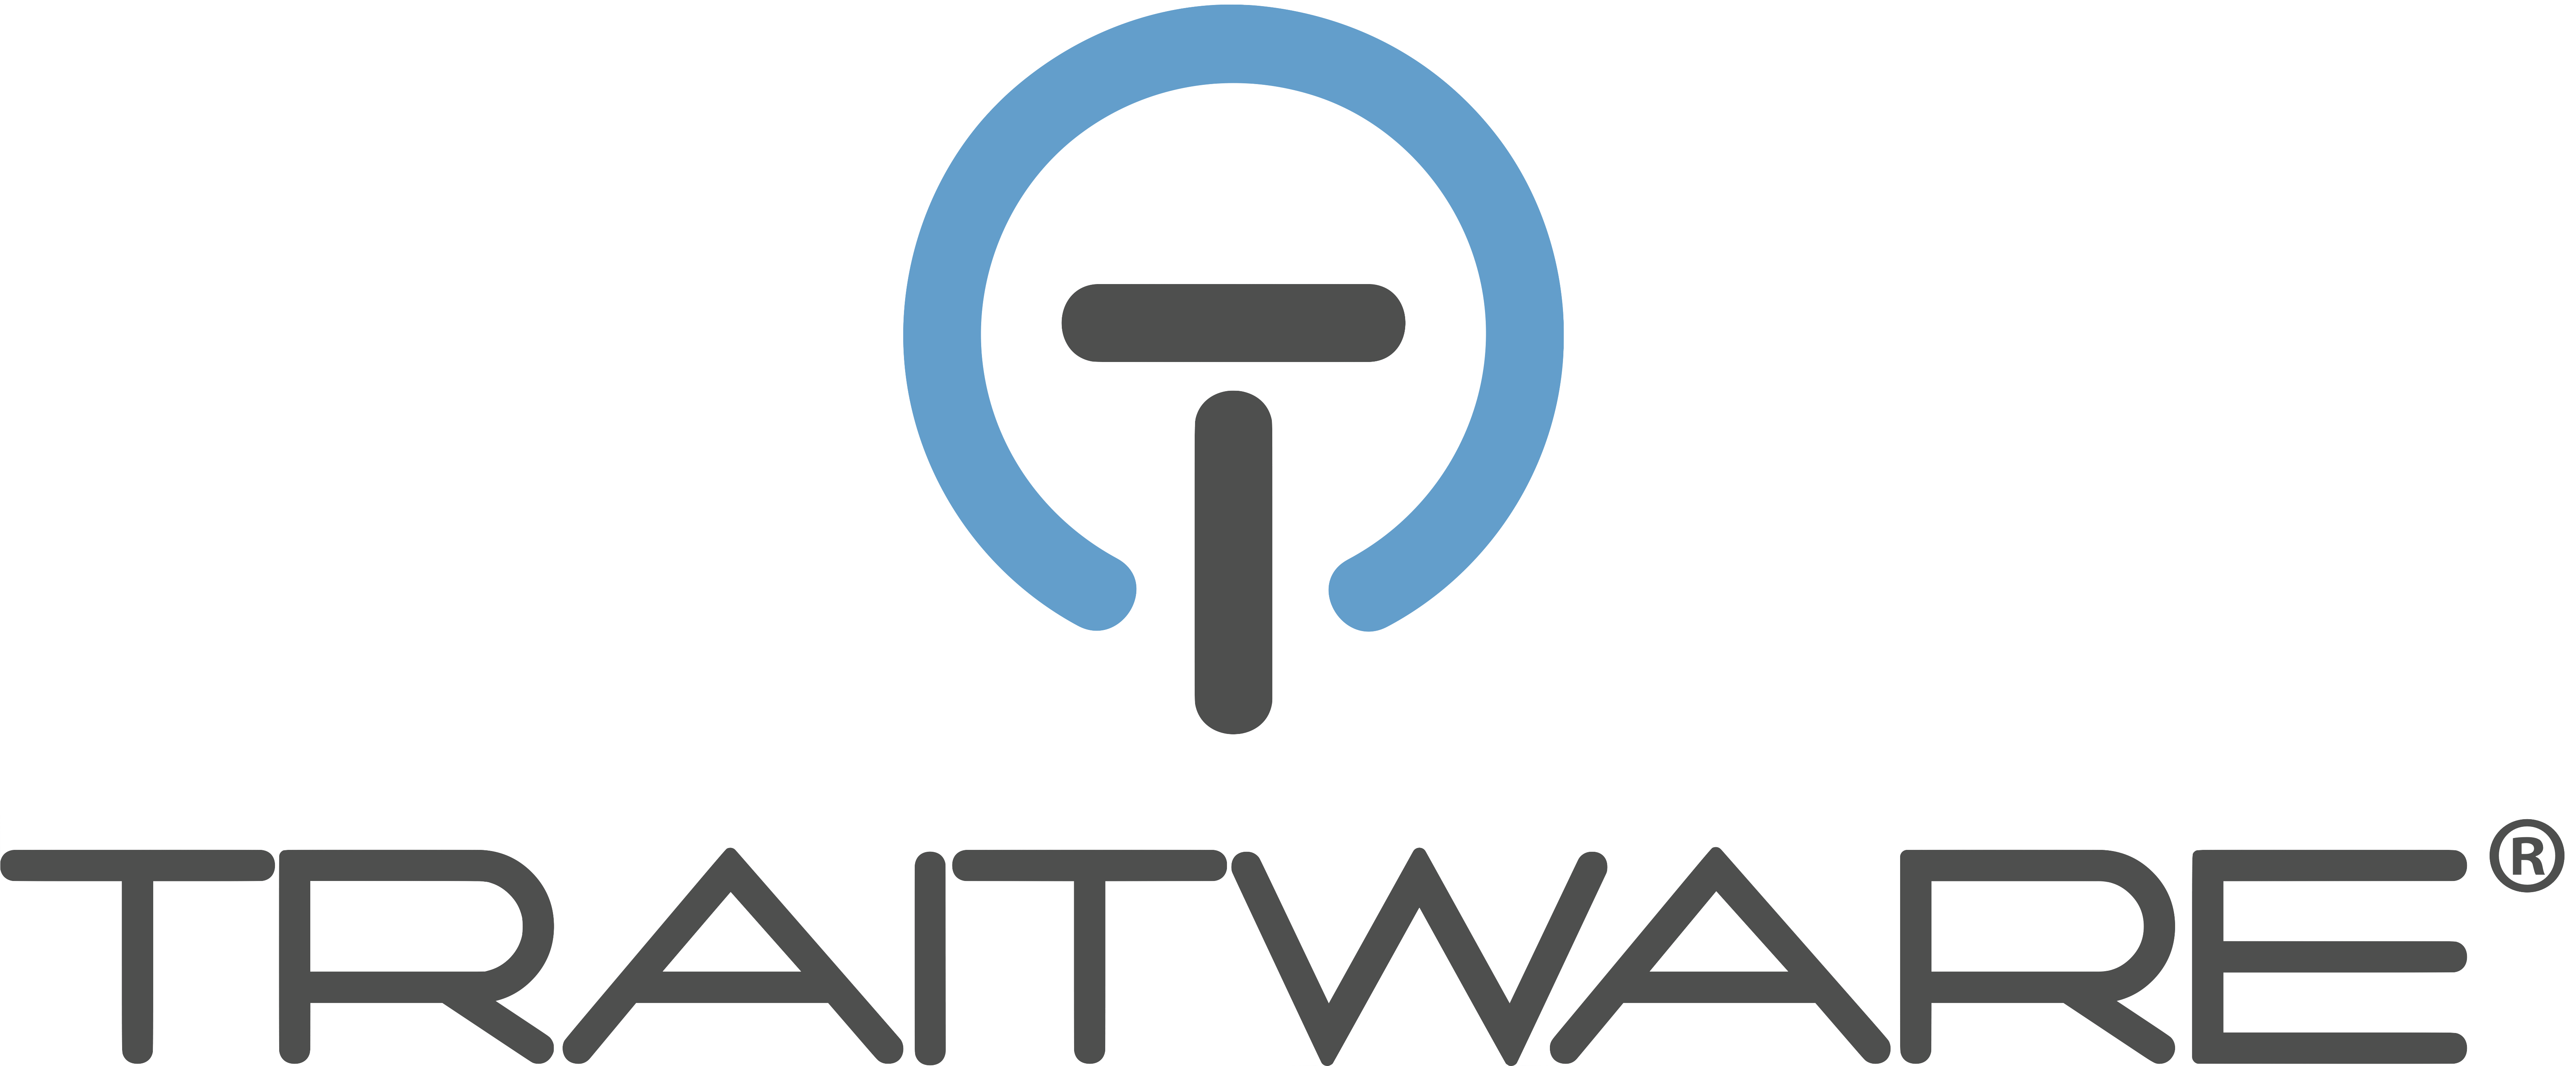 Traitware logo